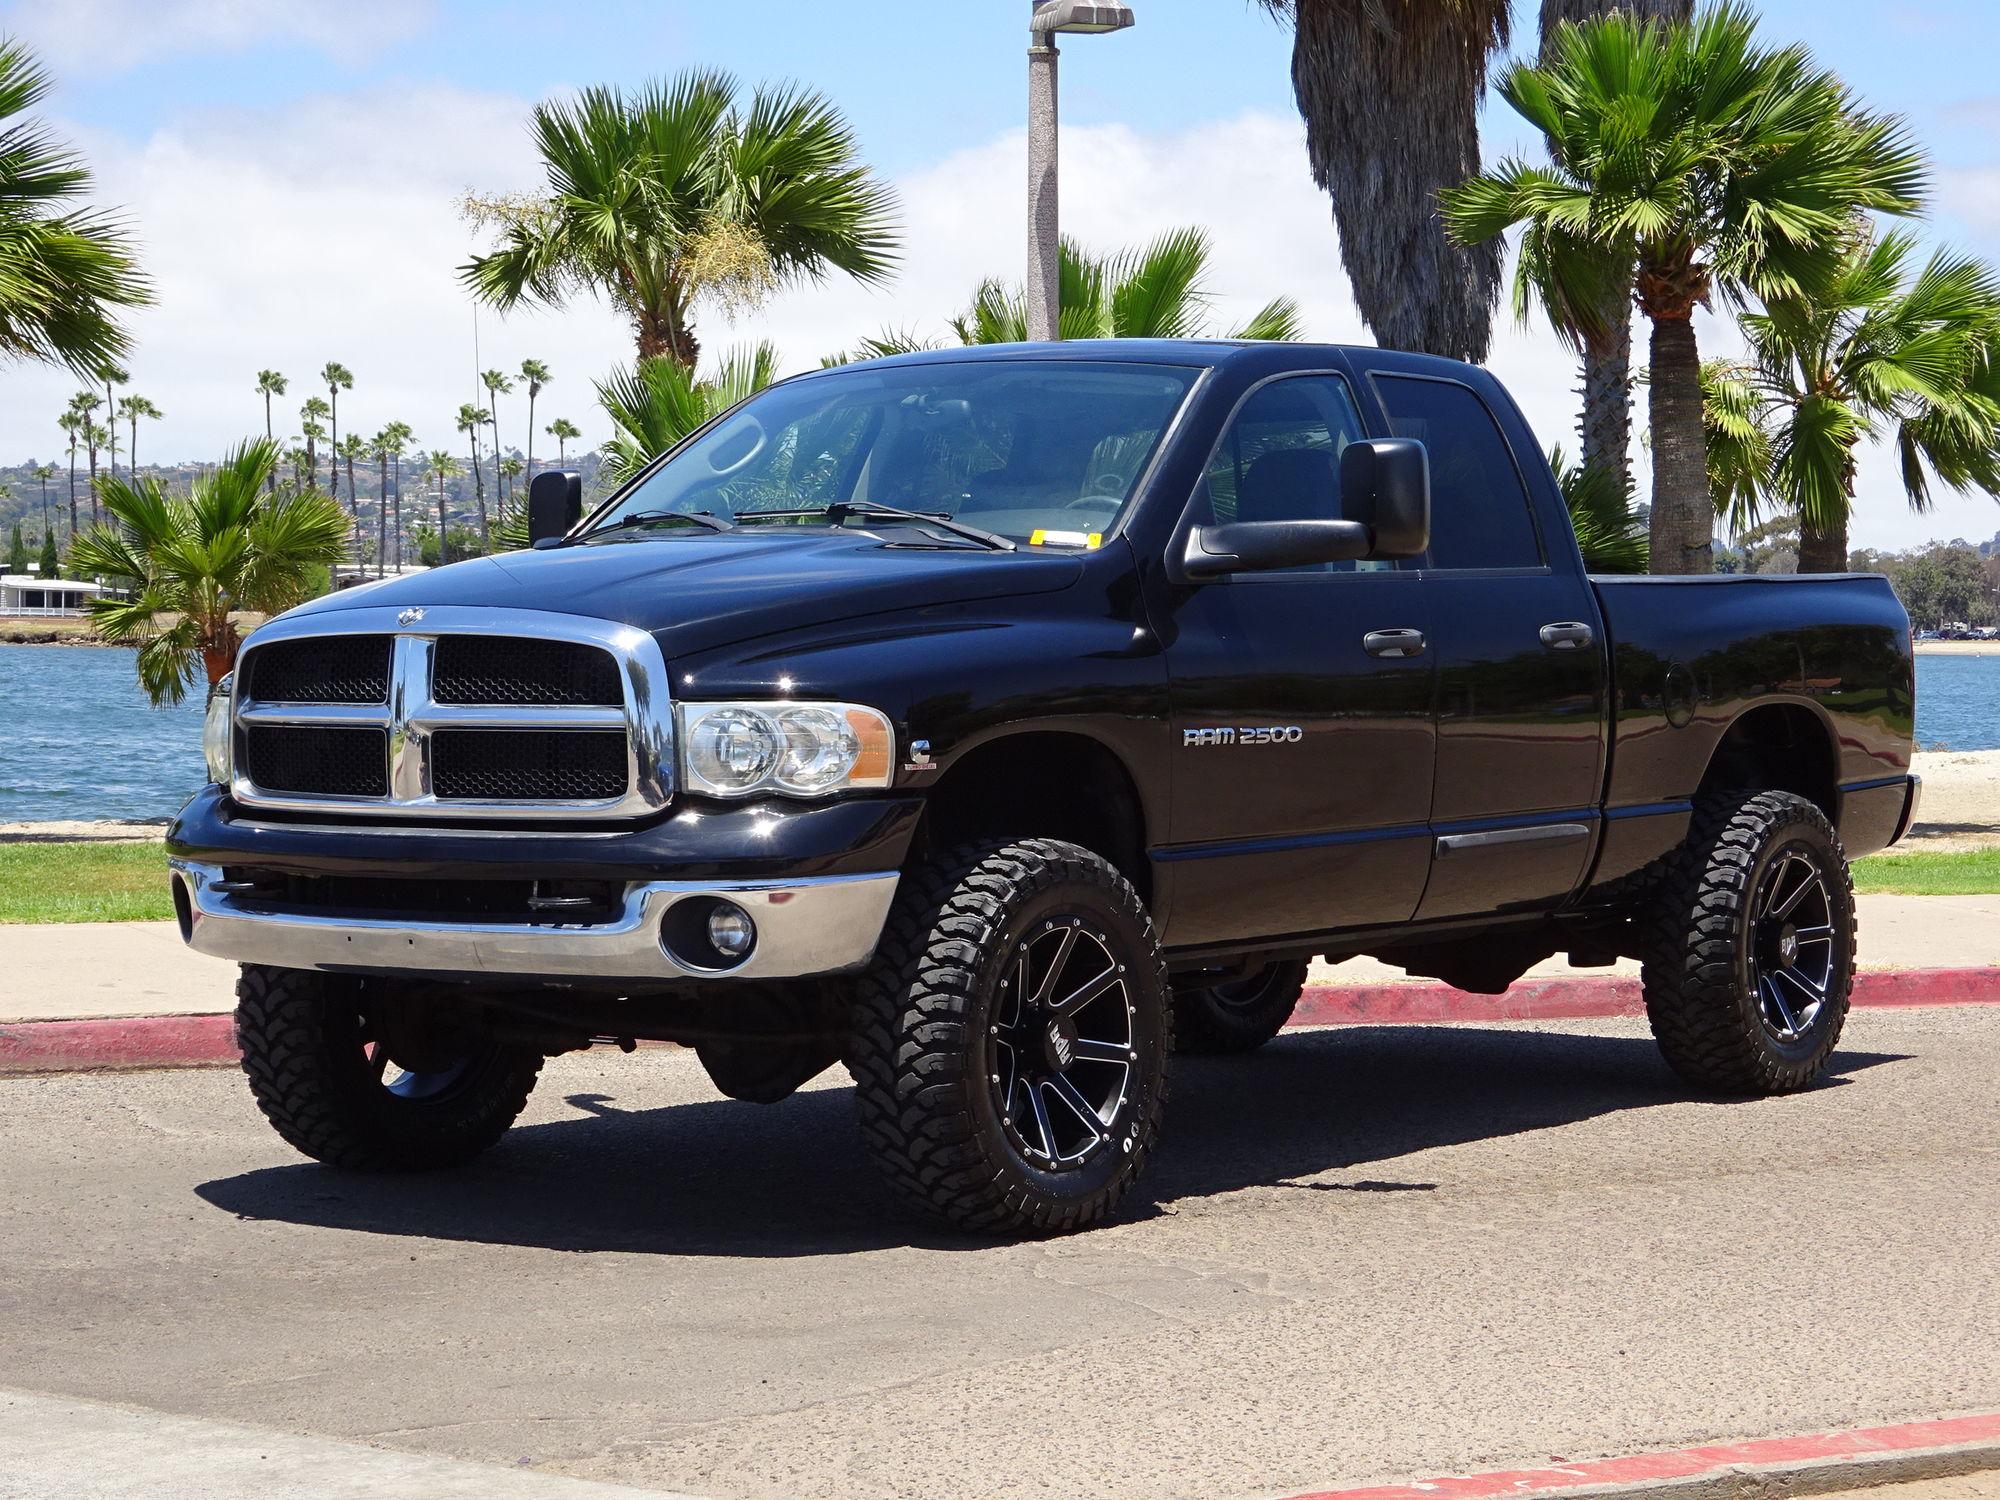 Dodge Trucks For Sale By Owner >> Truck For Sale 2005 dodge ram 2500 club cab 5.9l cummins 4x4 - Dodge Diesel - Diesel Truck ...